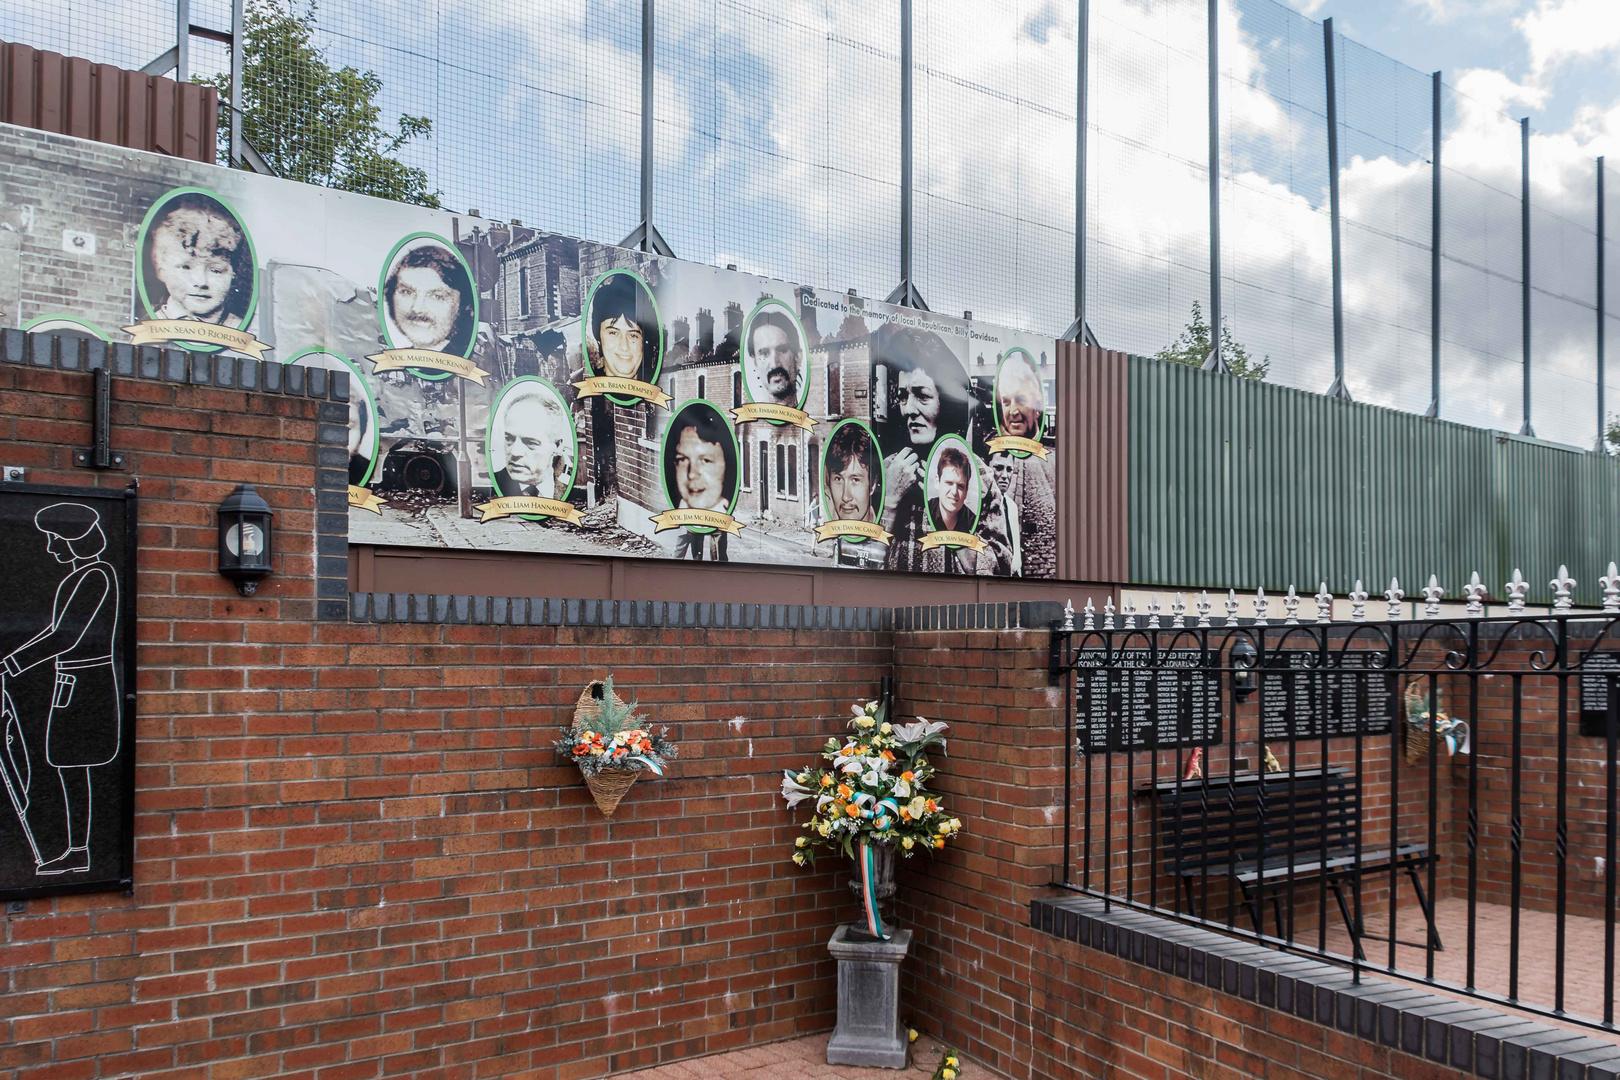 C1448 Belfast 2018 - Northern Ireland